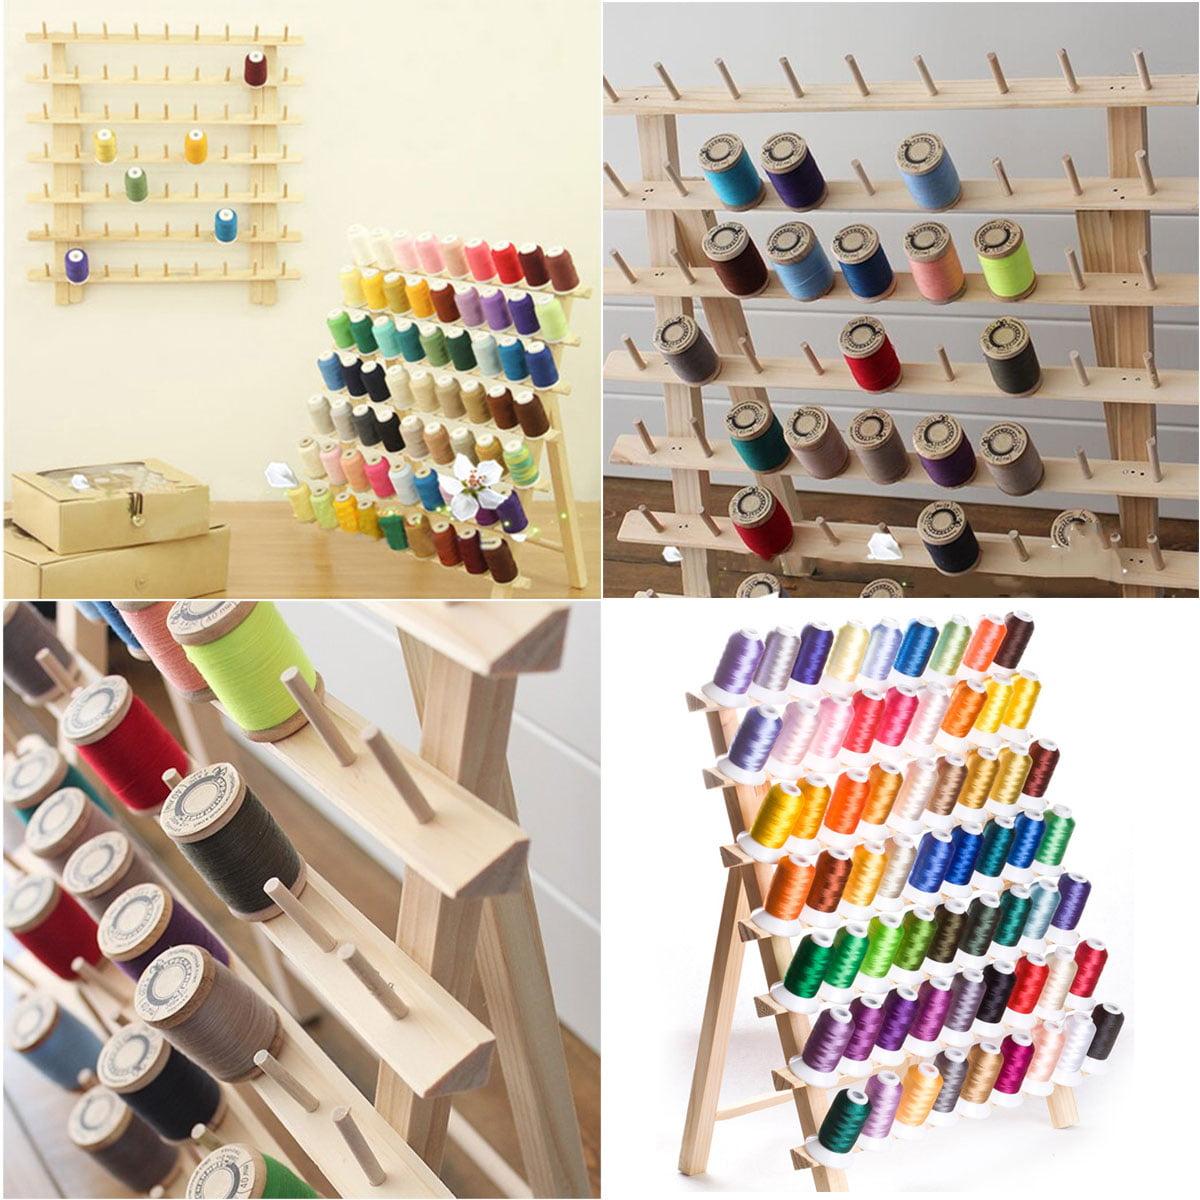 Wooden Sewing Thread-Rack-Sewing-Storage Organizer Embroidery Thread Holder Thread Spool Rack 120 Spool